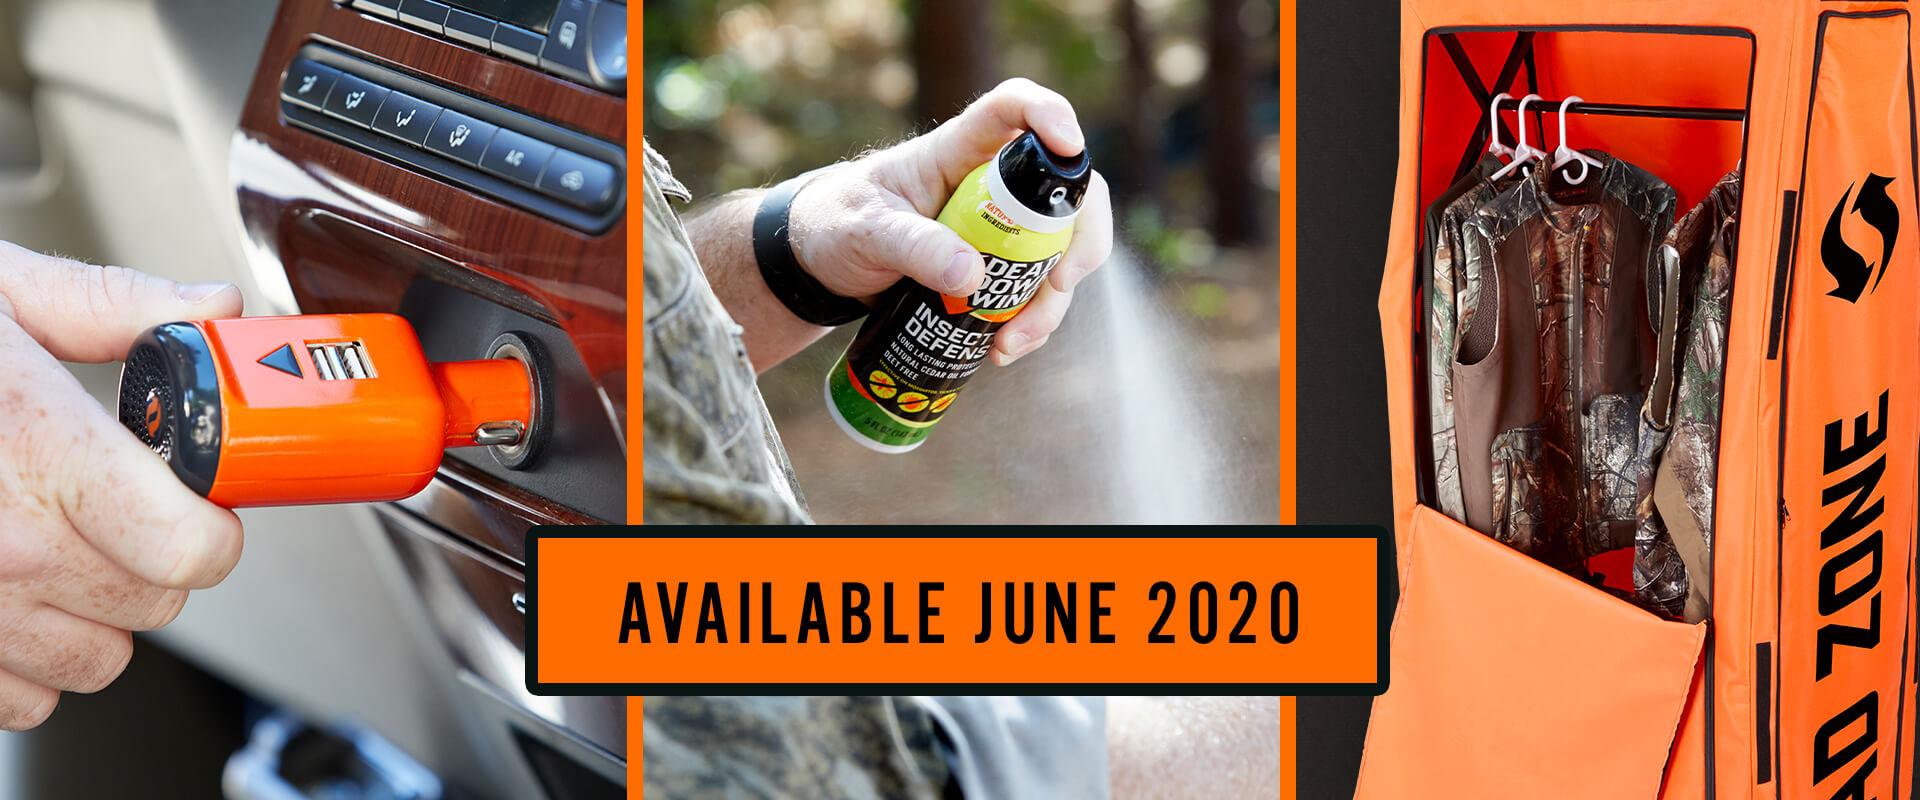 New DDW Products 2020